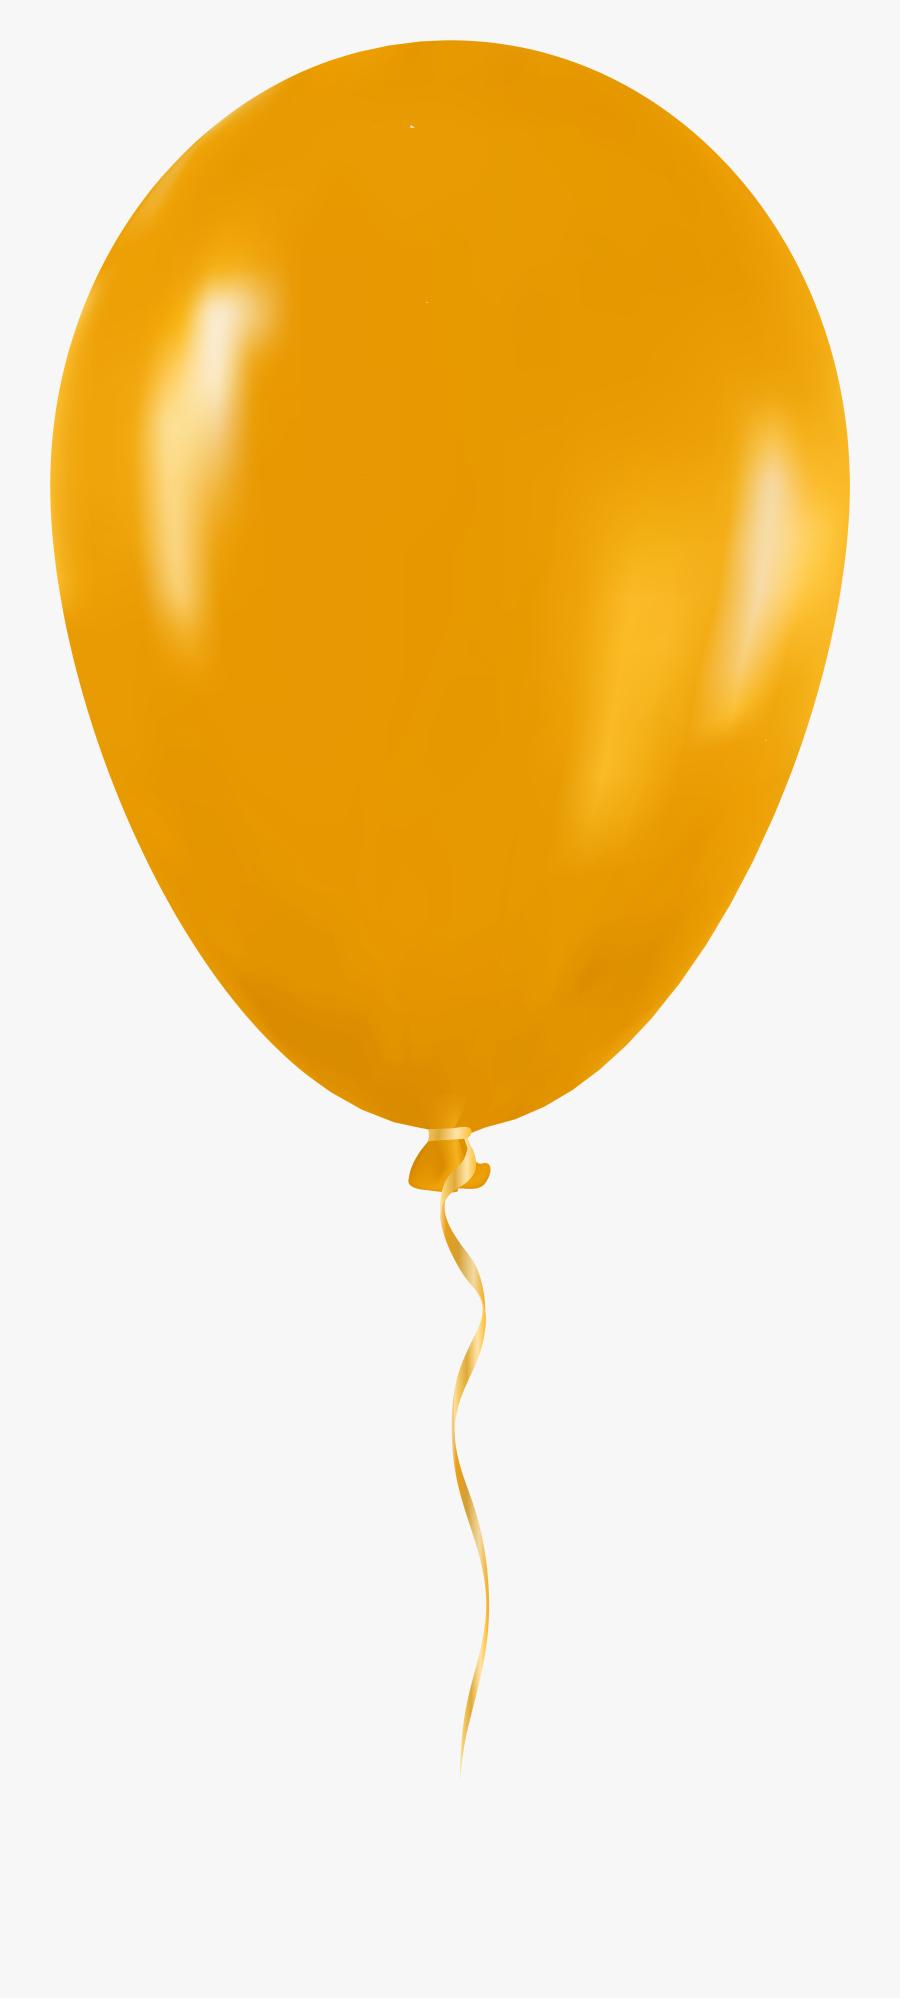 Yellow Balloon Png Clip Art - Yellow Balloon Transparent Background, Transparent Clipart